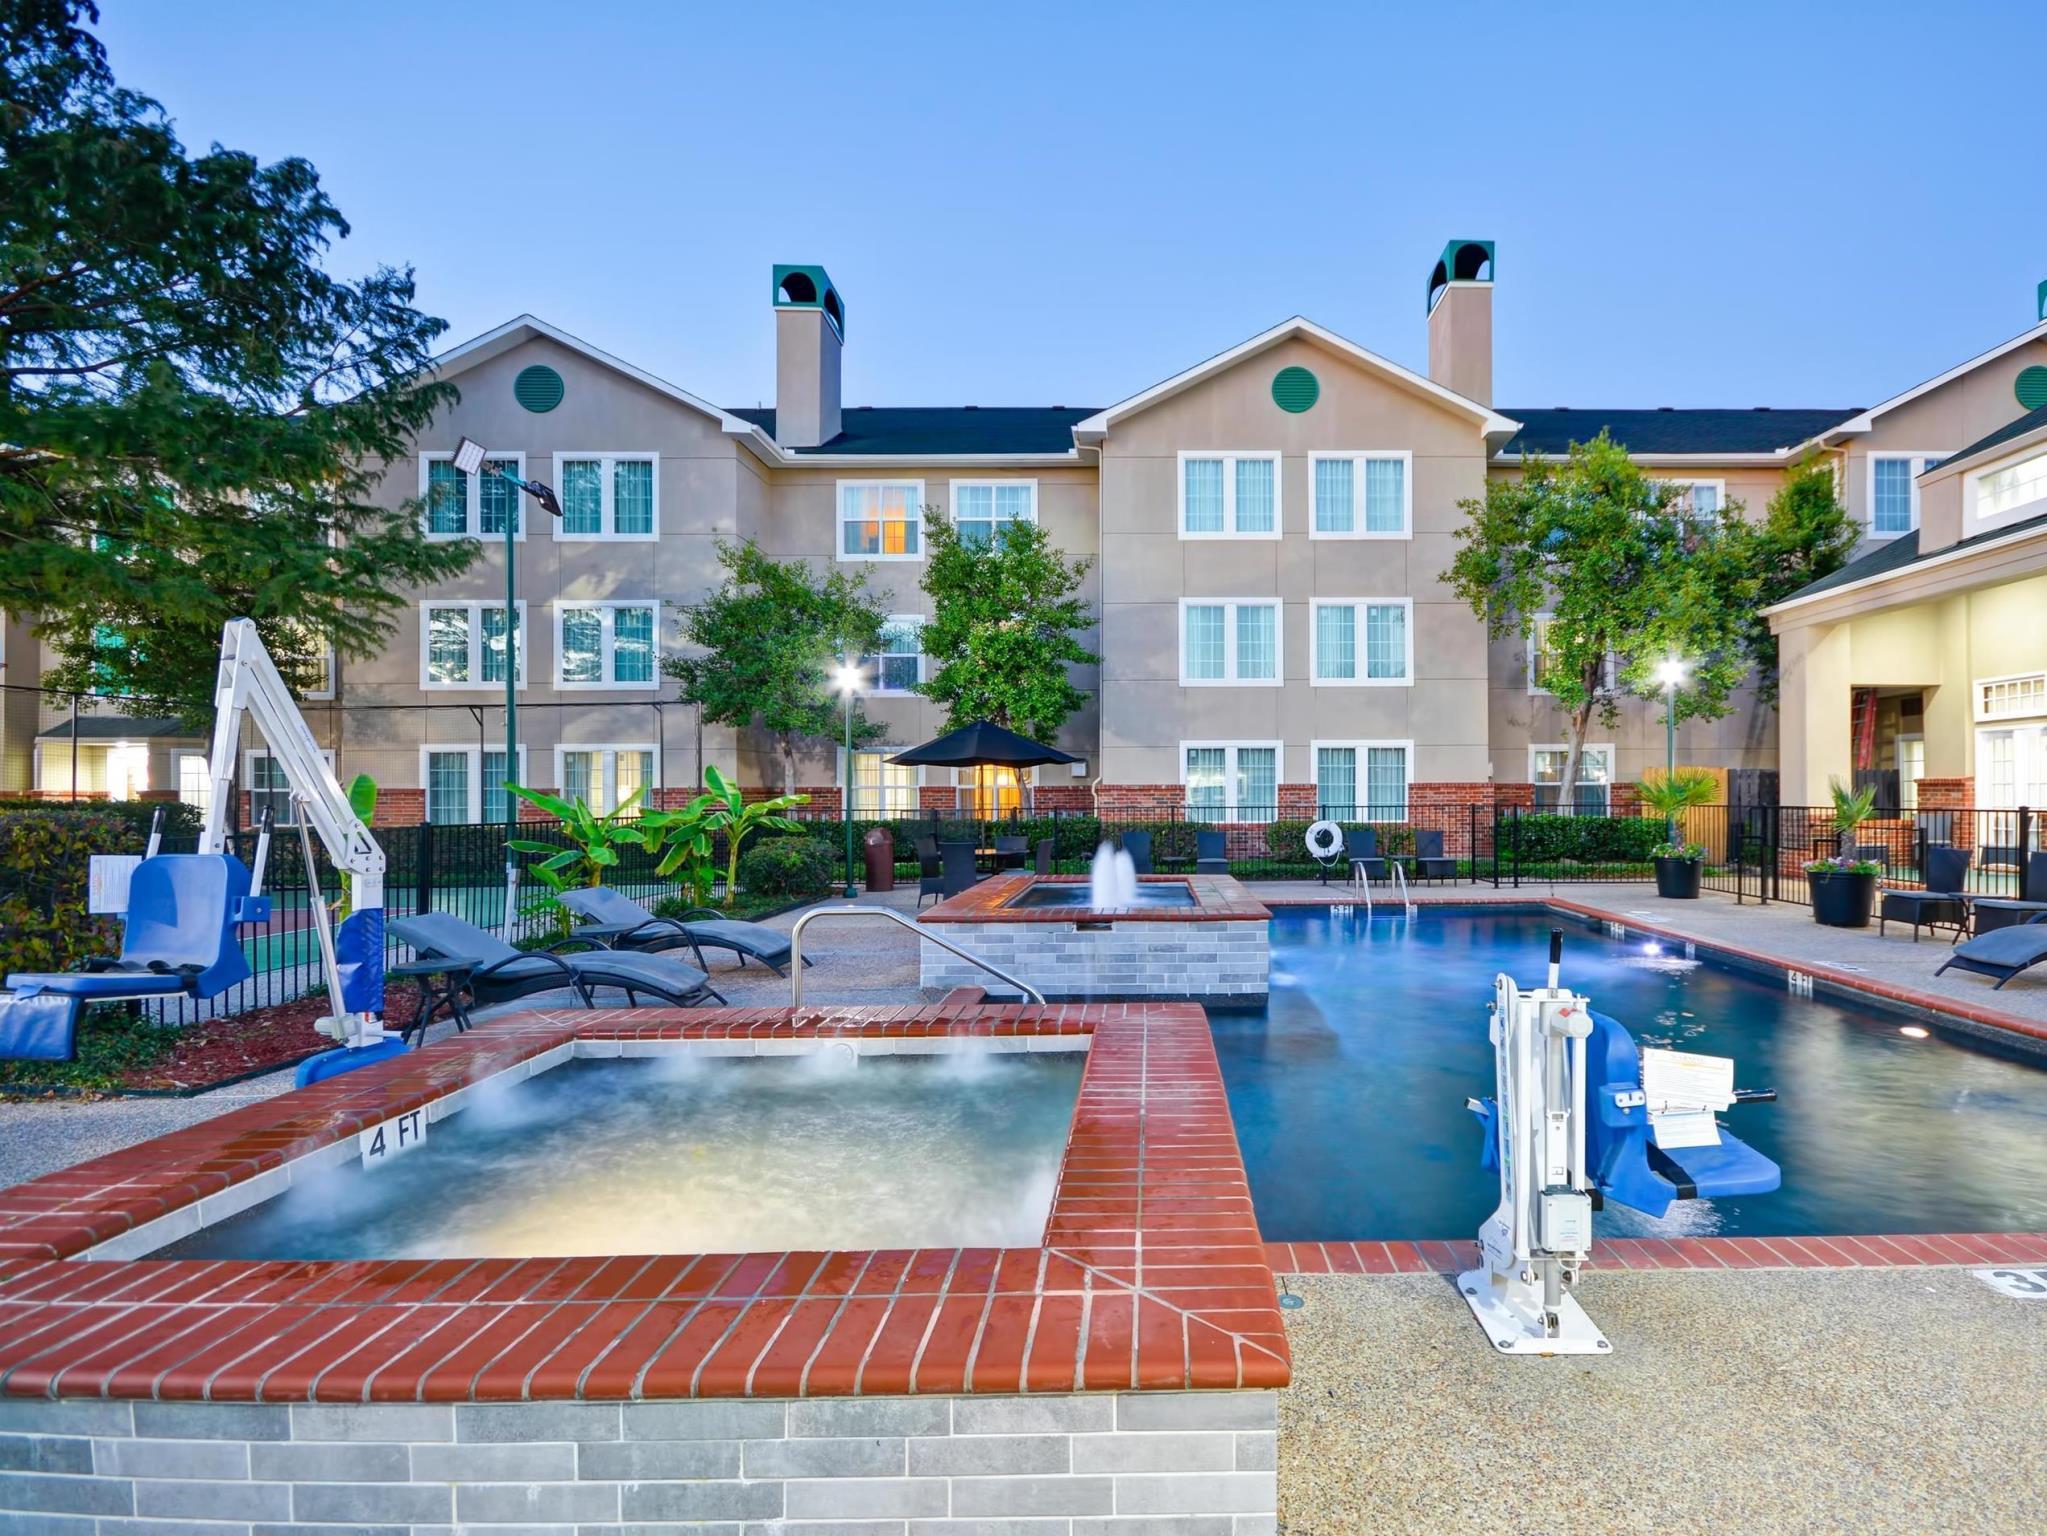 Homewood Suites By Hilton Dallas Lewisville